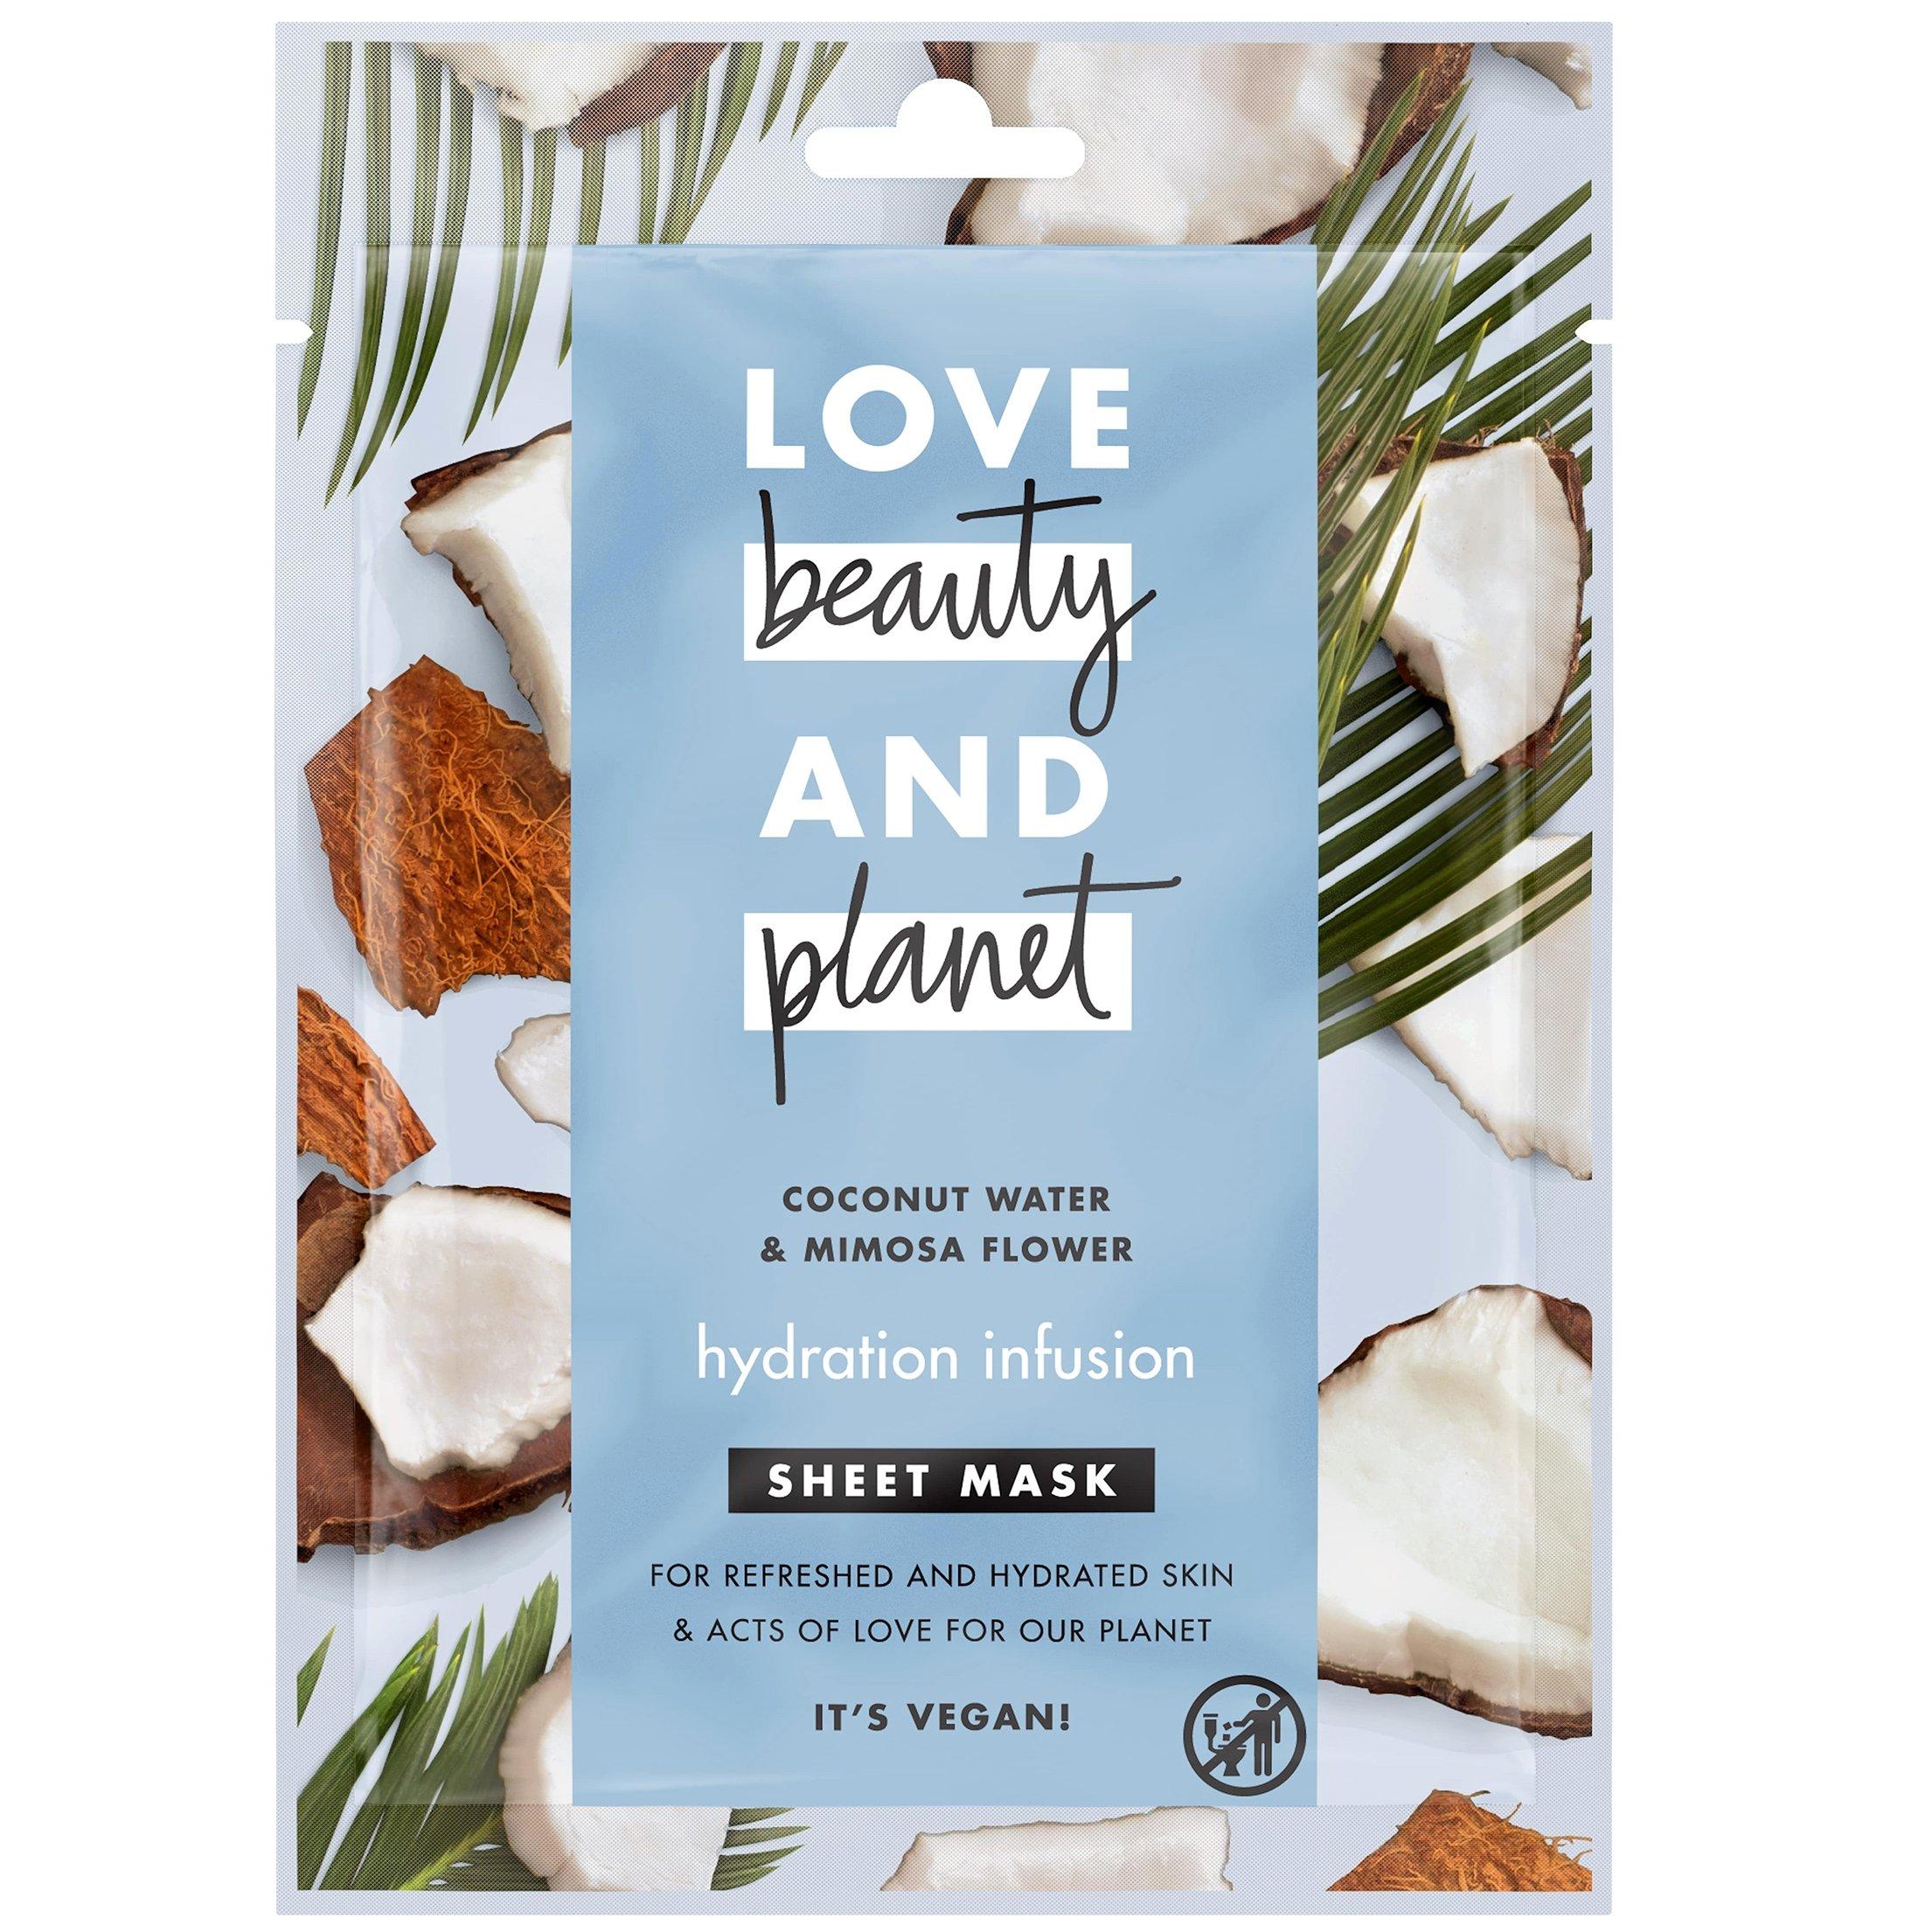 Love Beauty and Planet Face Shett Mask Coconut, Μάσκα Προσώπου για Φρέσκια & Ενυδατωμένη Επιδερμίδα 21ml